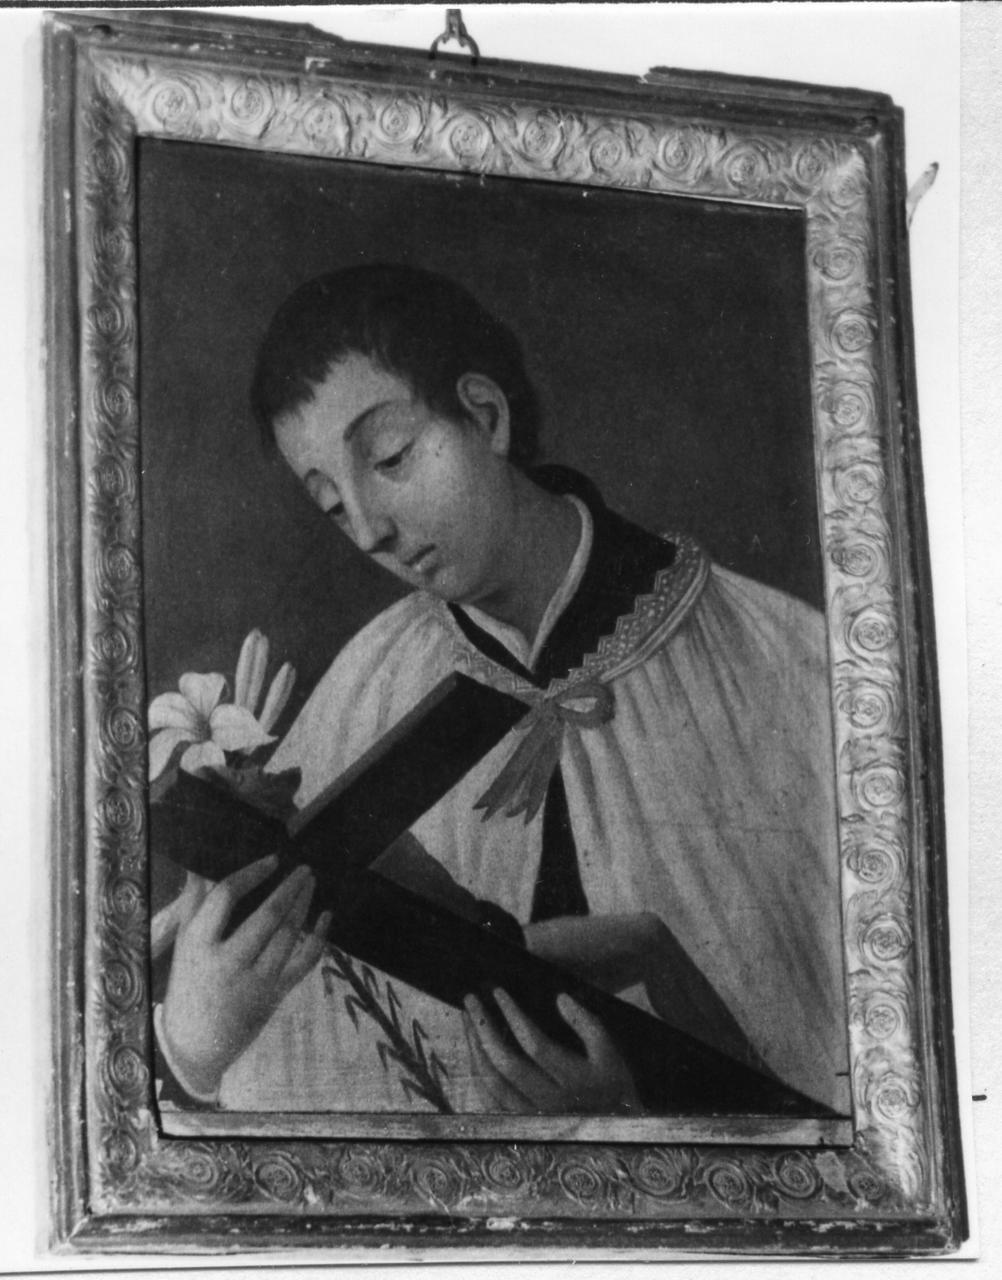 San Luigi Gonzaga (dipinto) - ambito modenese (sec. XIX)